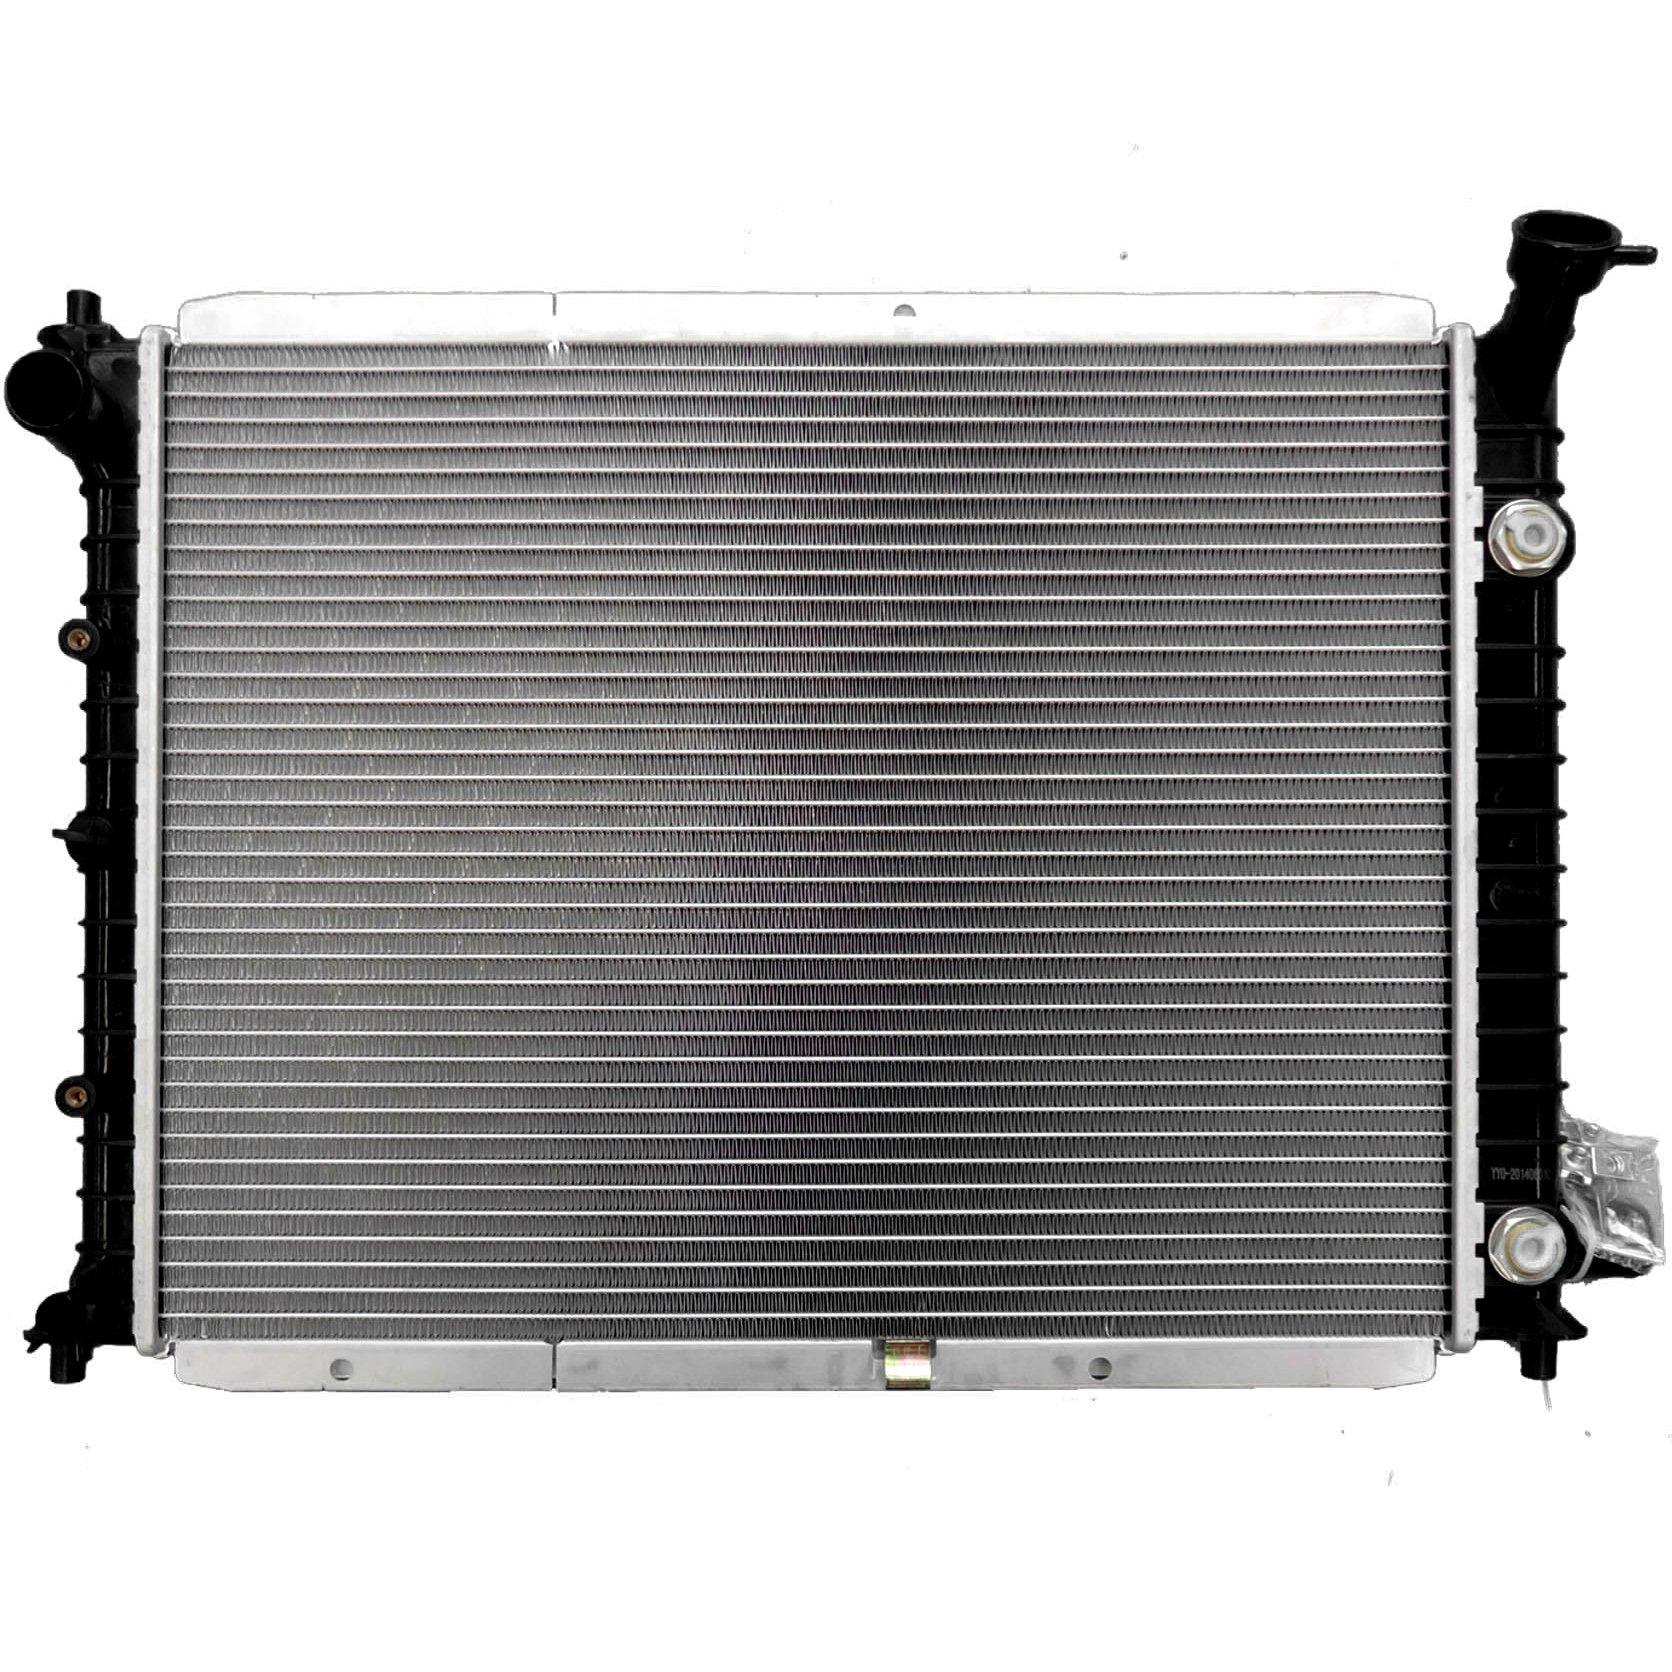 ECCPP 1273 Radiator fits for Ford Escort 1991-1999 Wagon 1.9L 2.0L 1992-2002 2.0L 1991-1996 Hatchback 2/4-Door 1.8L 1.9L